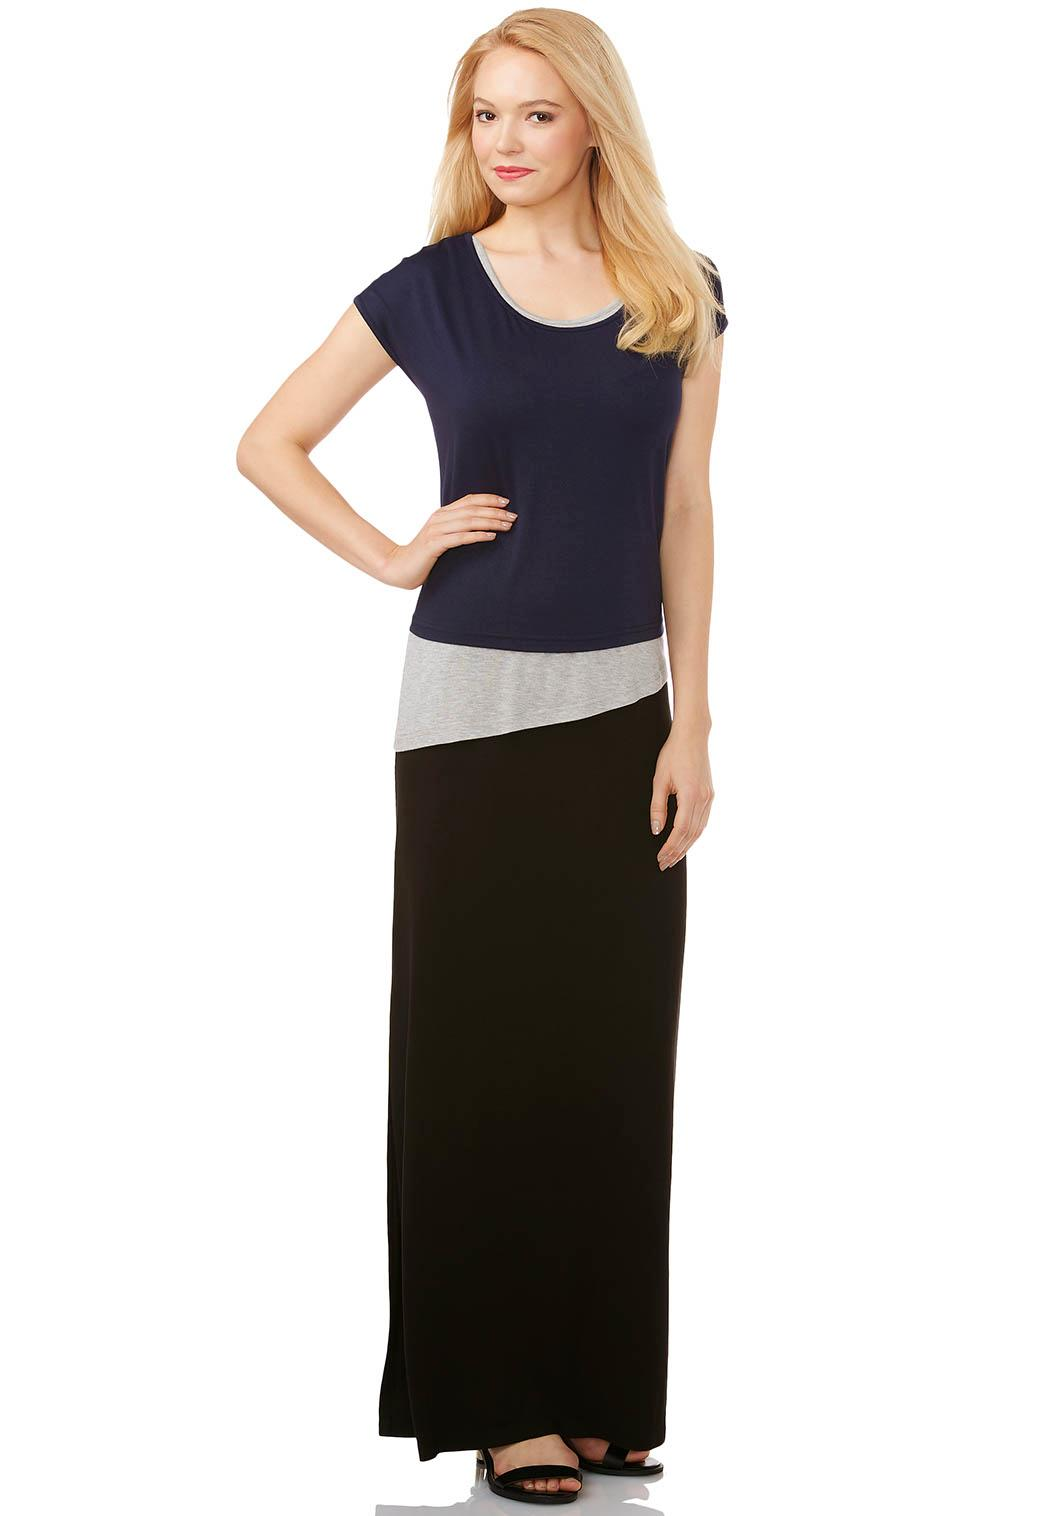 Catofashions.com Dresses Cato Fashions